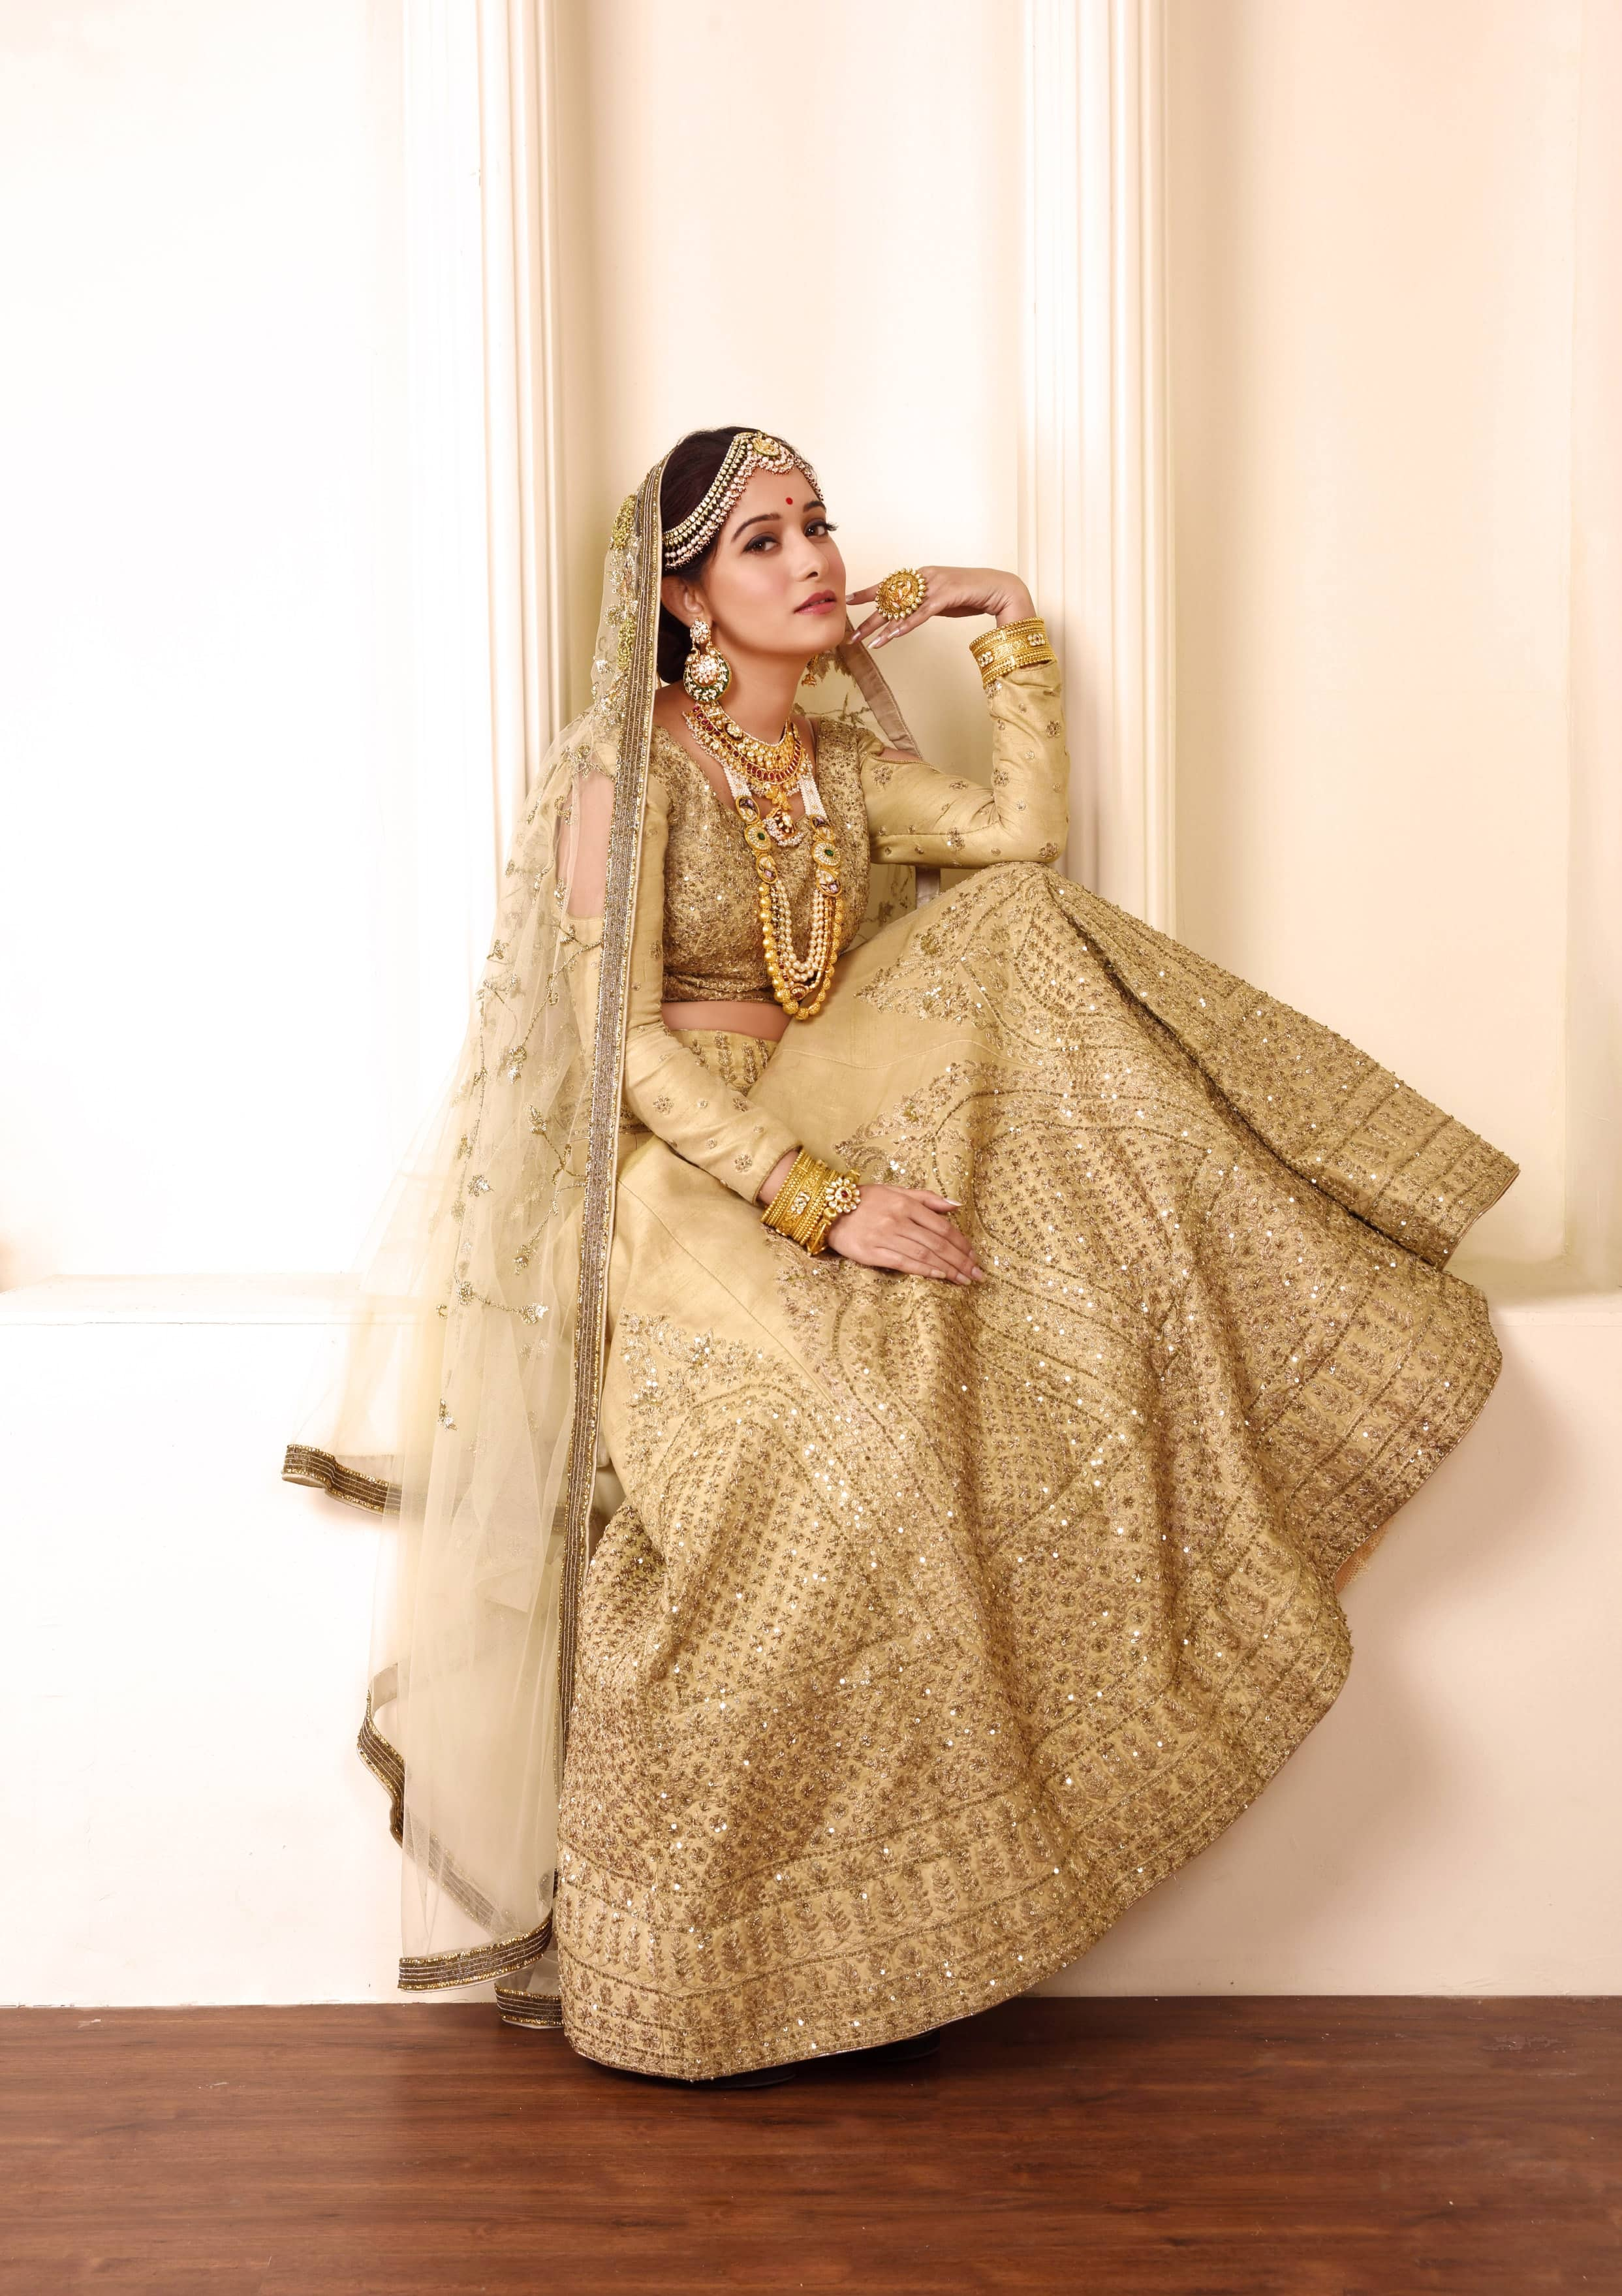 Bride Of The Month Preetika Rao